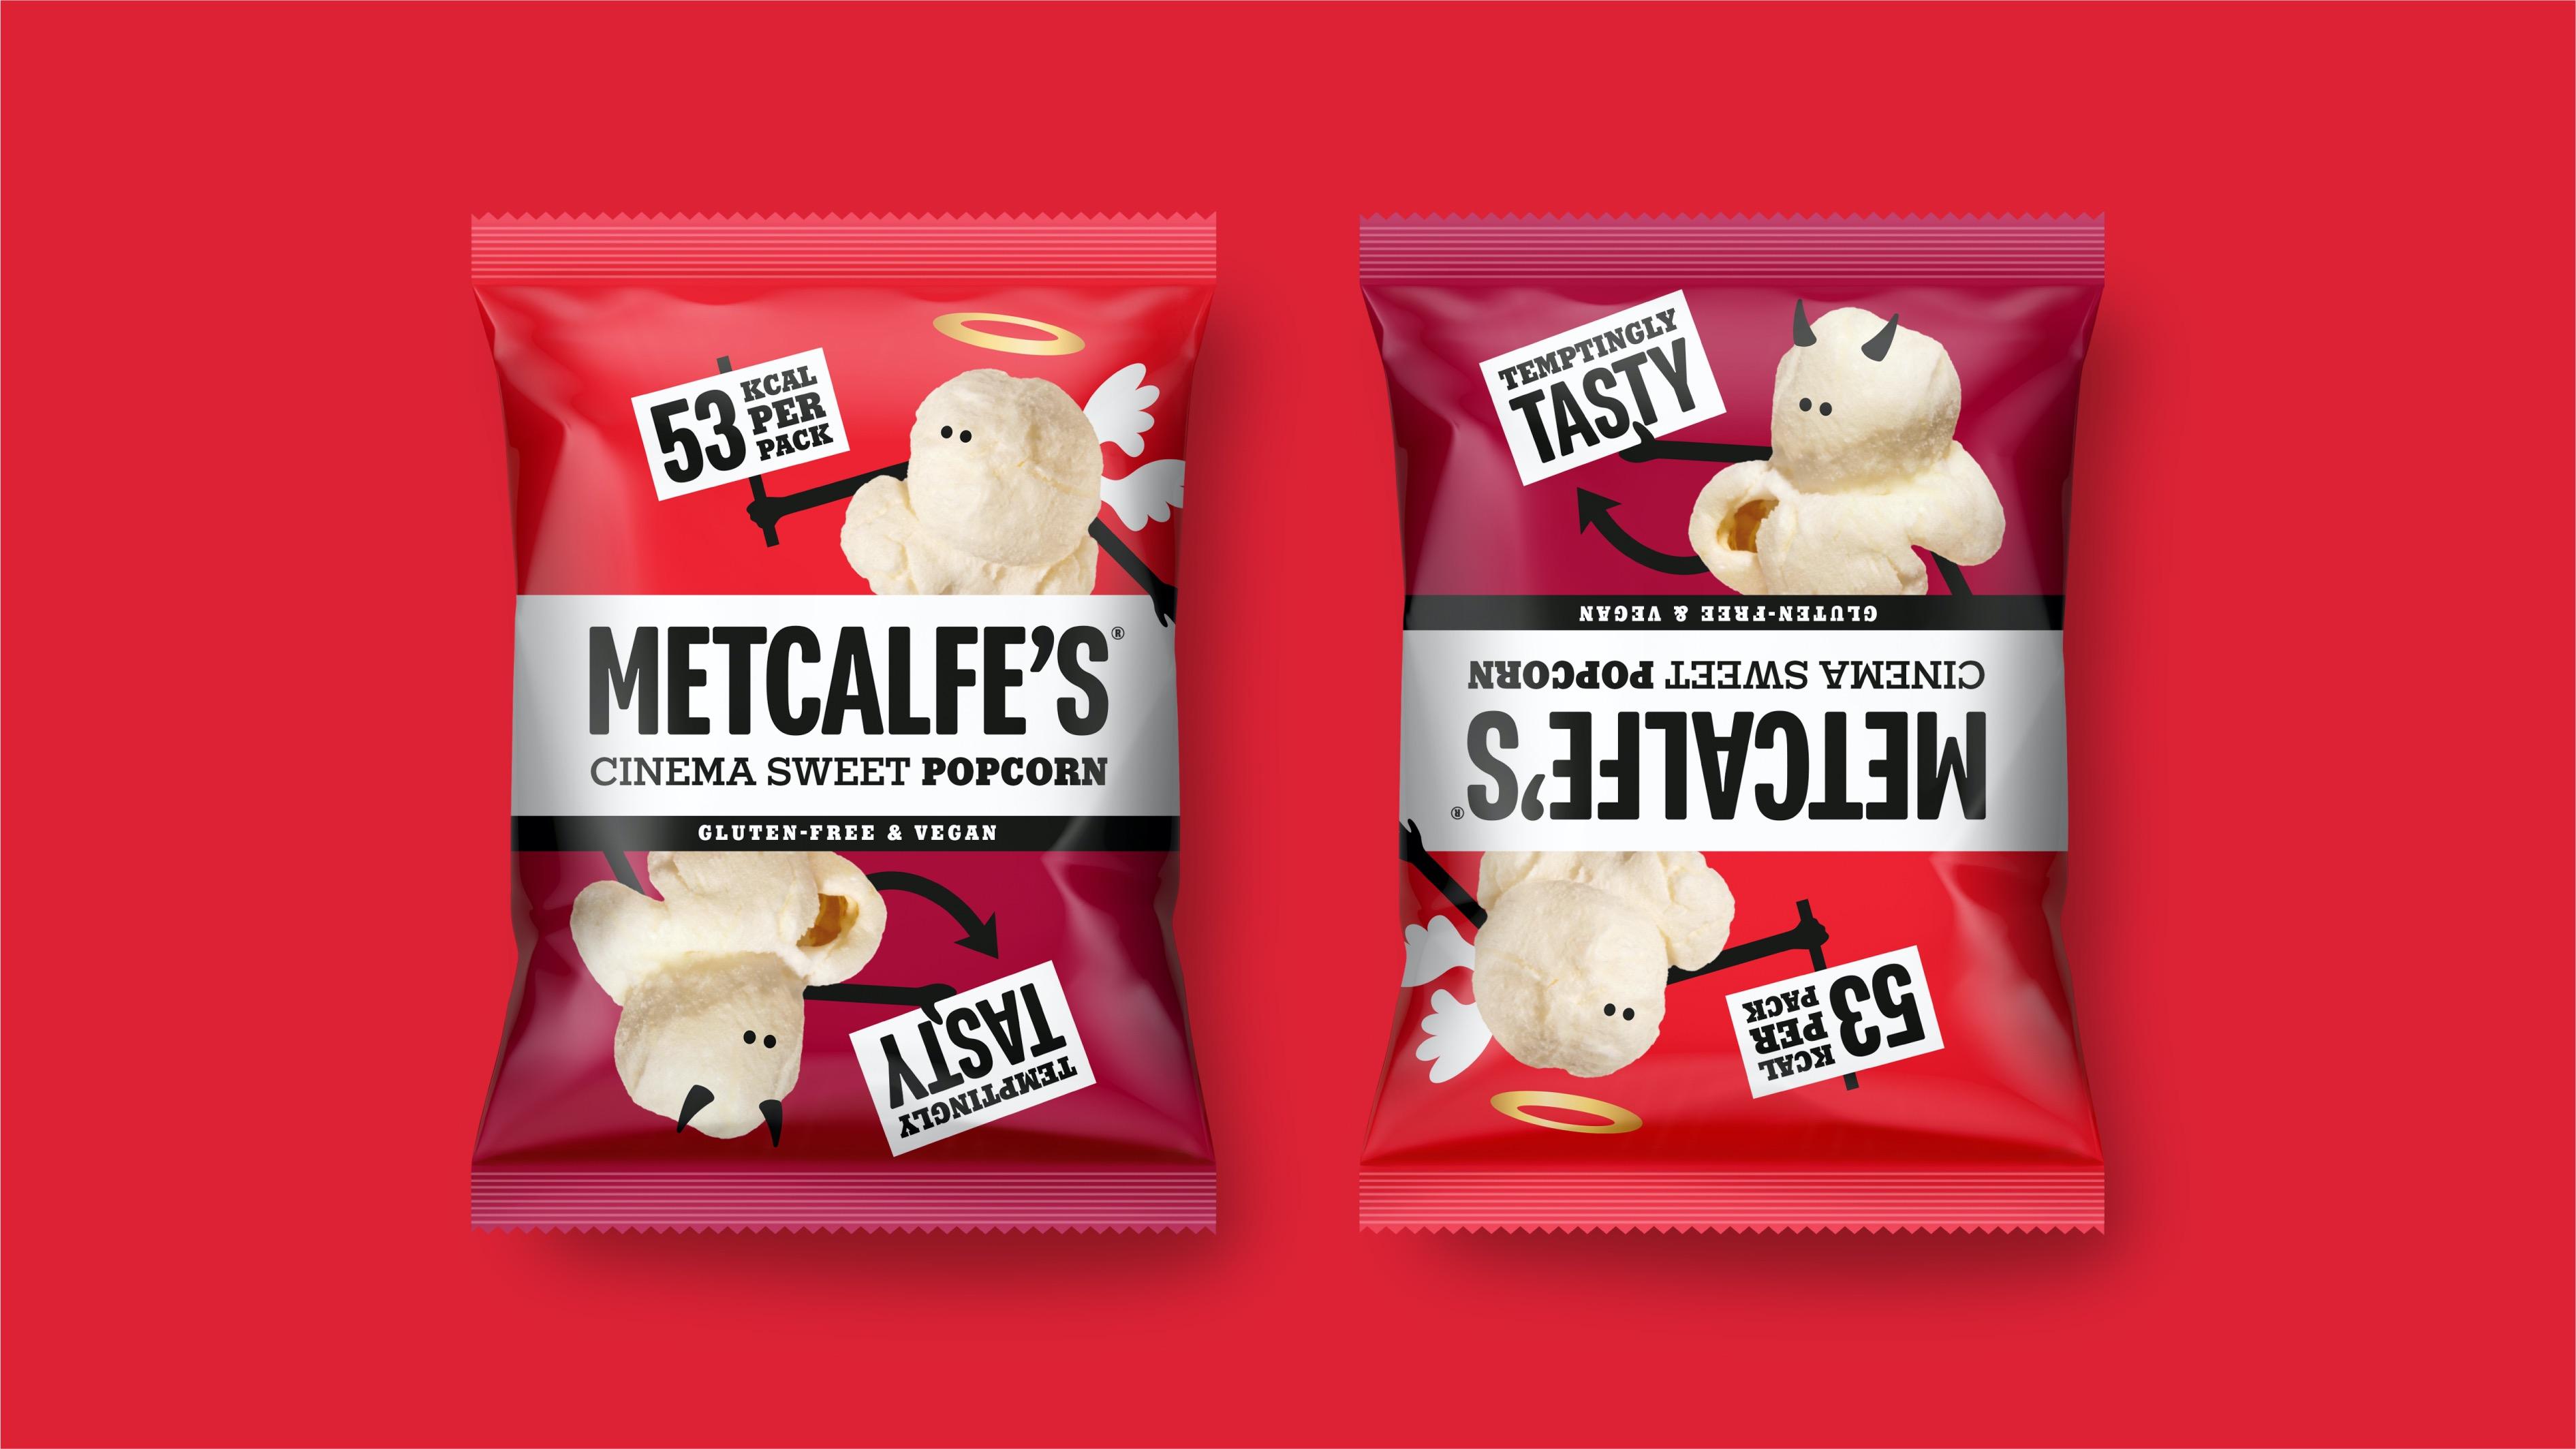 Derek&Eric Create Metcalfe's Popcorn and Snacks Brand and Packaging Design